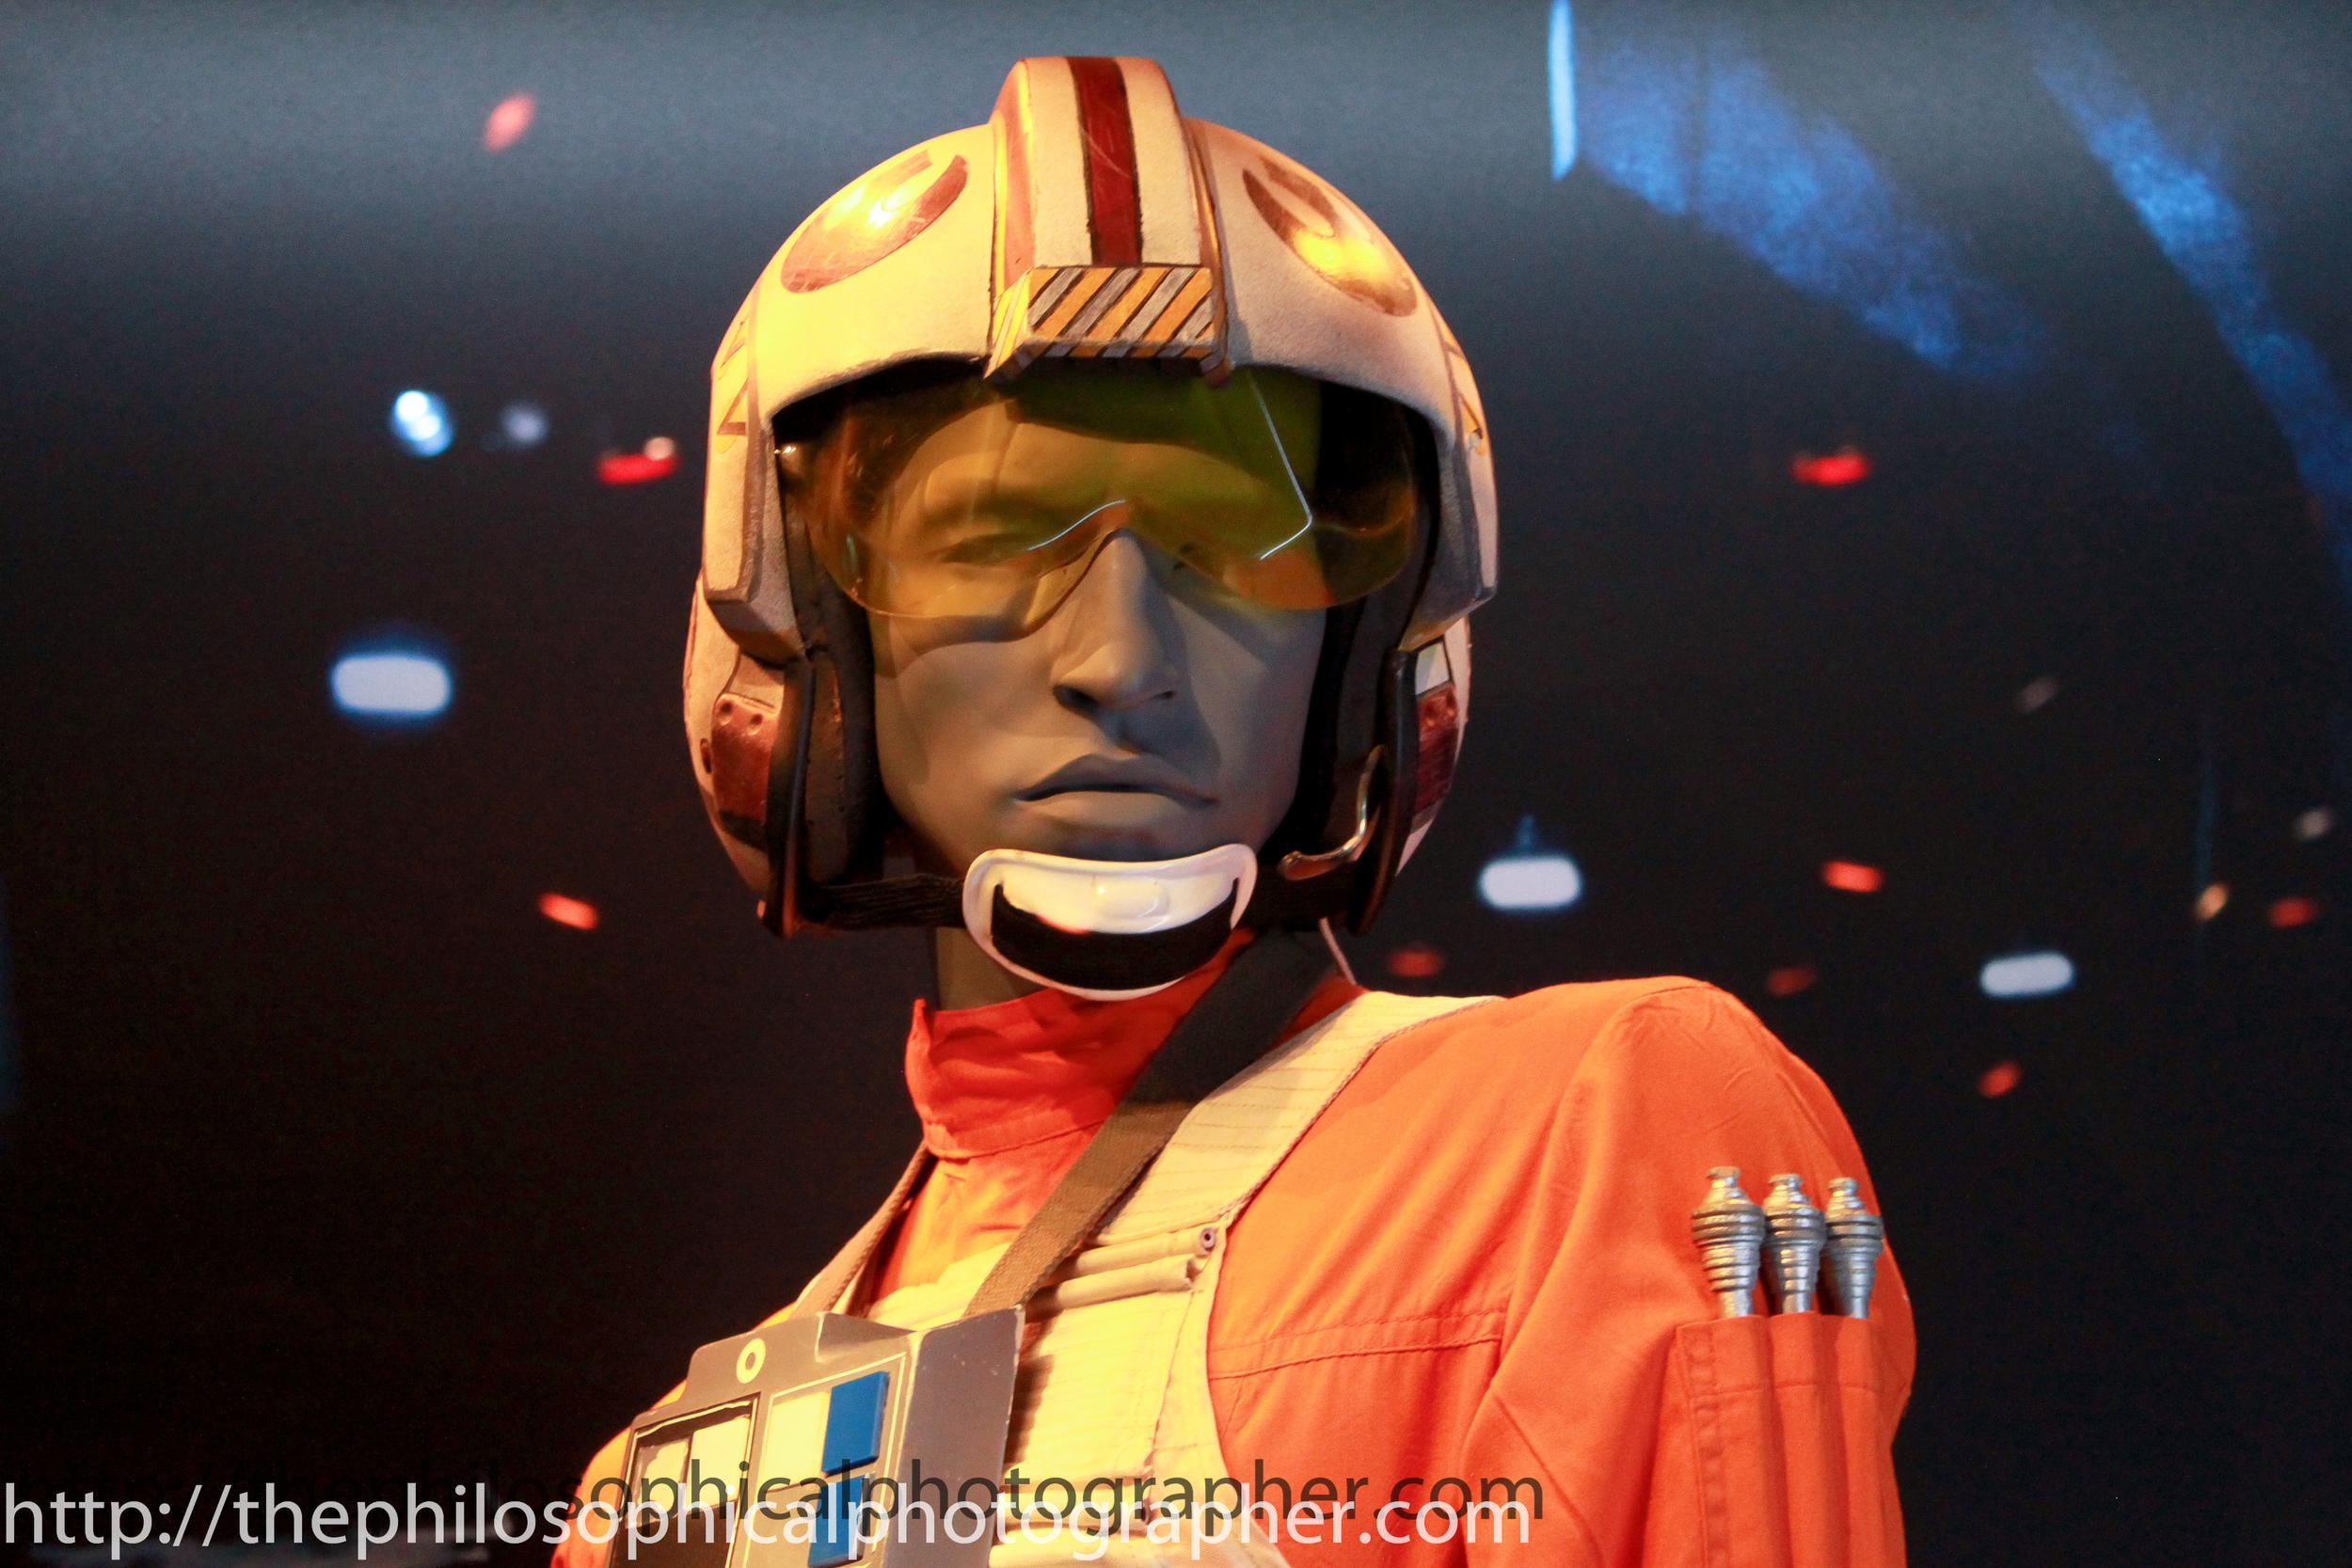 Luke Skywalker Rebel Pilot Outfit